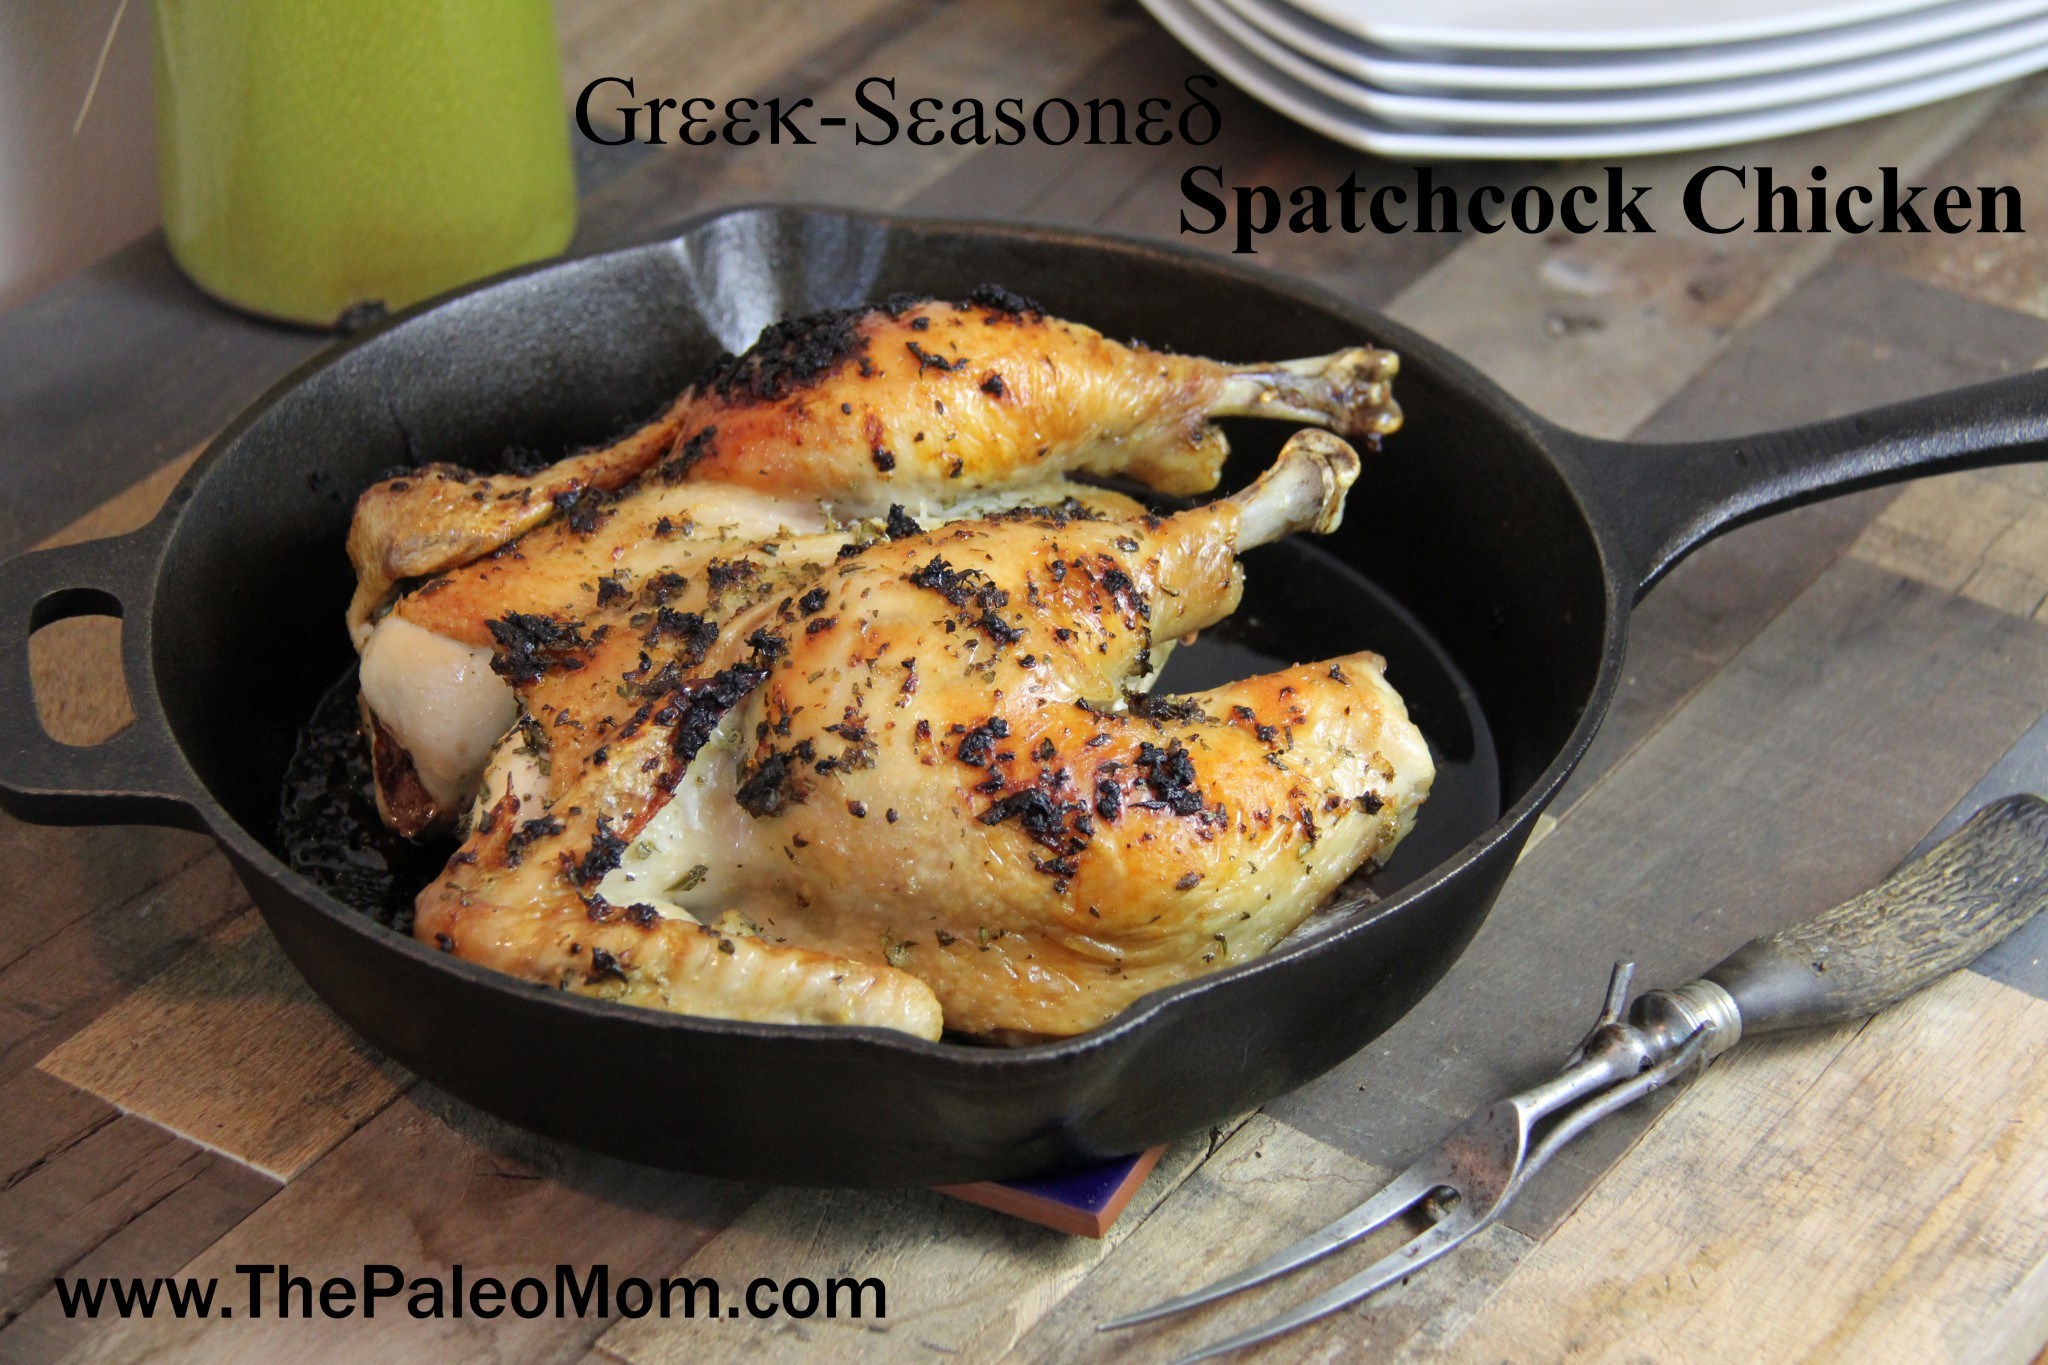 Greek-Seasoned Spatchcock Chicken | The Paleo Mom